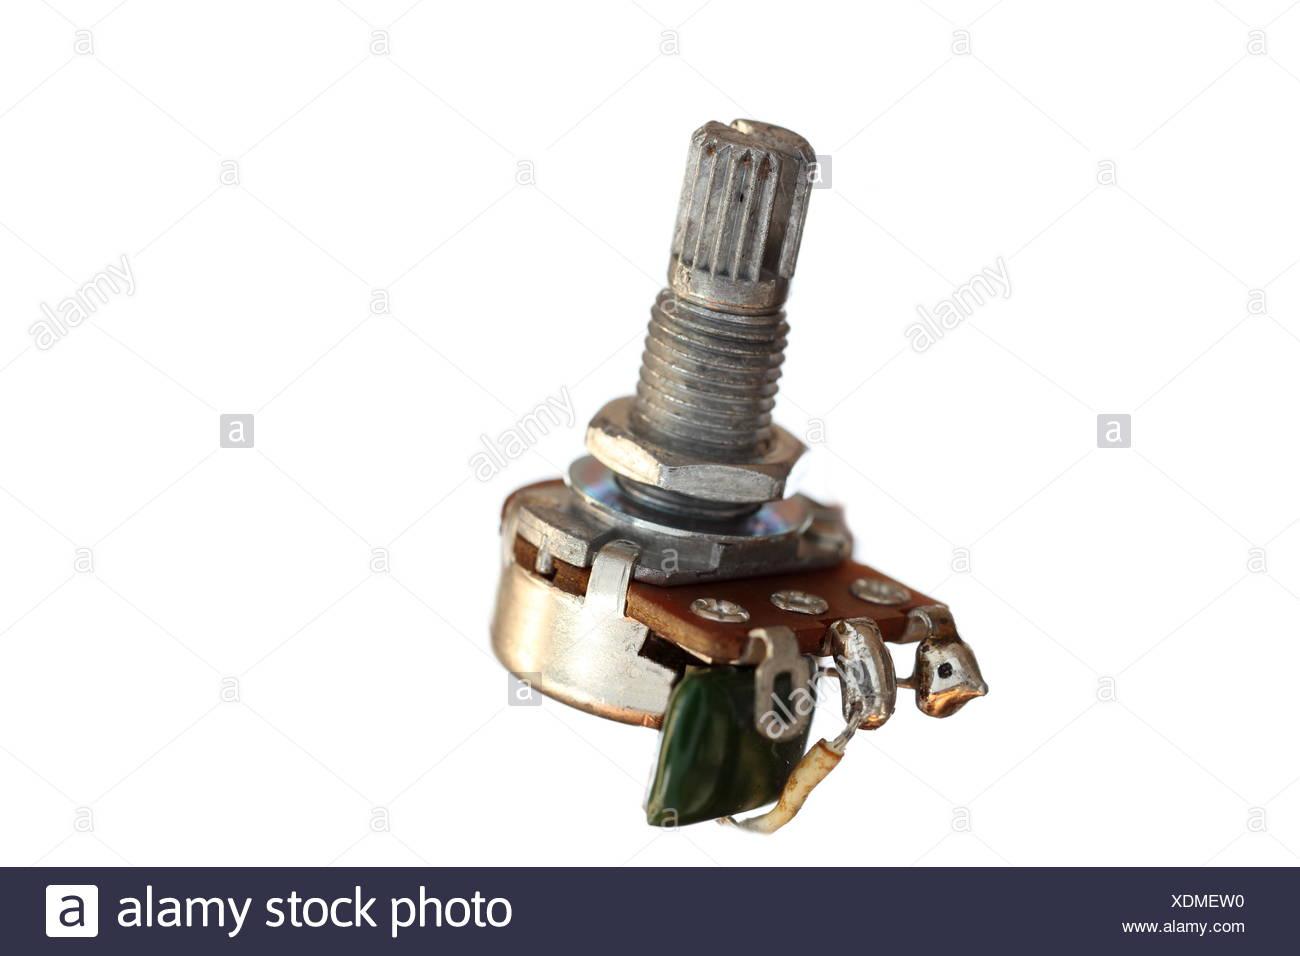 Variable Resistor Stock Photos Images Alamy Circuit Diagram Potentiometer Image